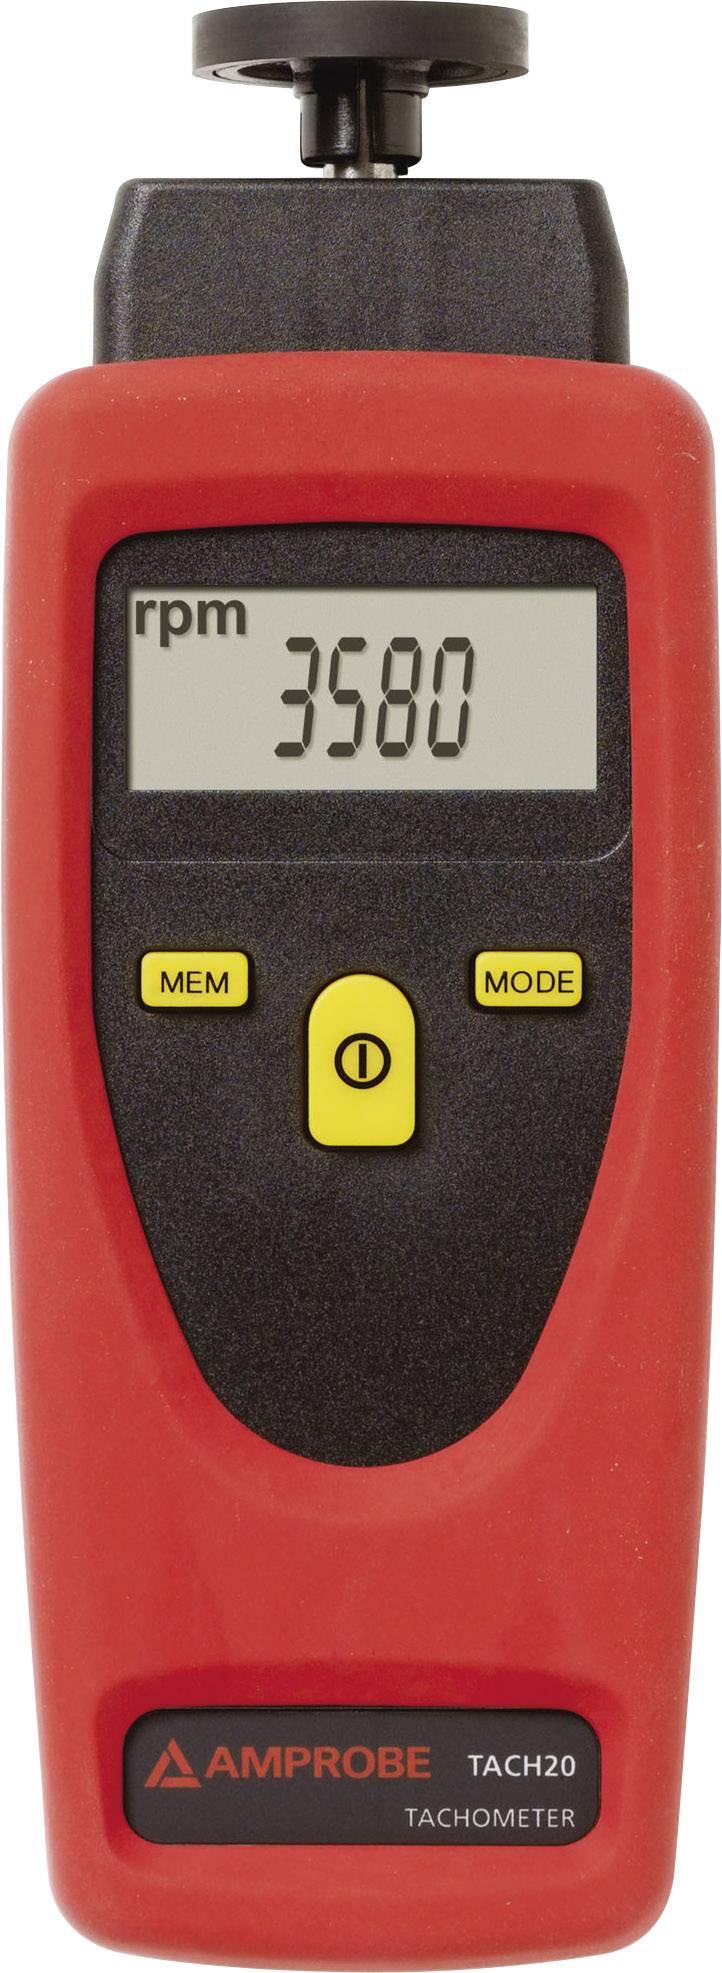 Otáčkoměr Beha Amprobe 3311961, 1 - 99999 ot./min, bez certifikátu